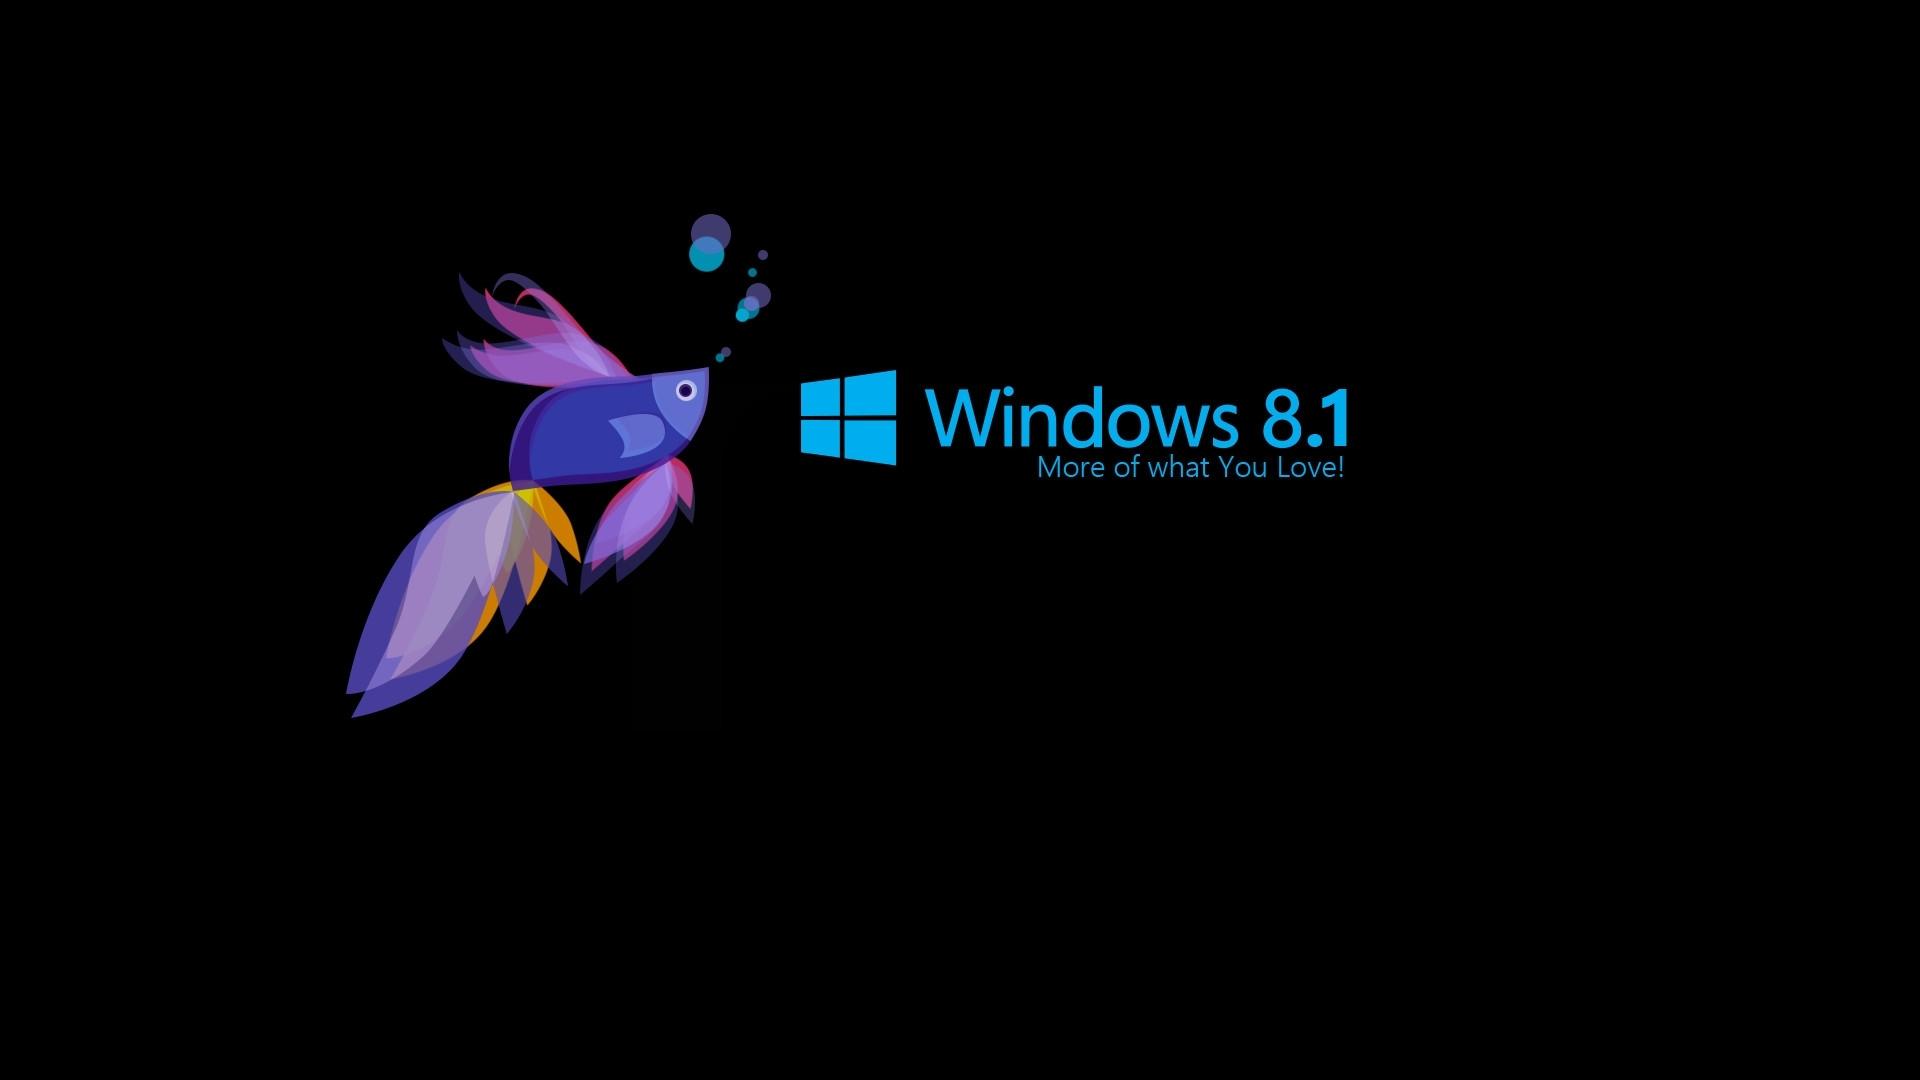 windows 81 wallpaper hd 1080p (53+ images)